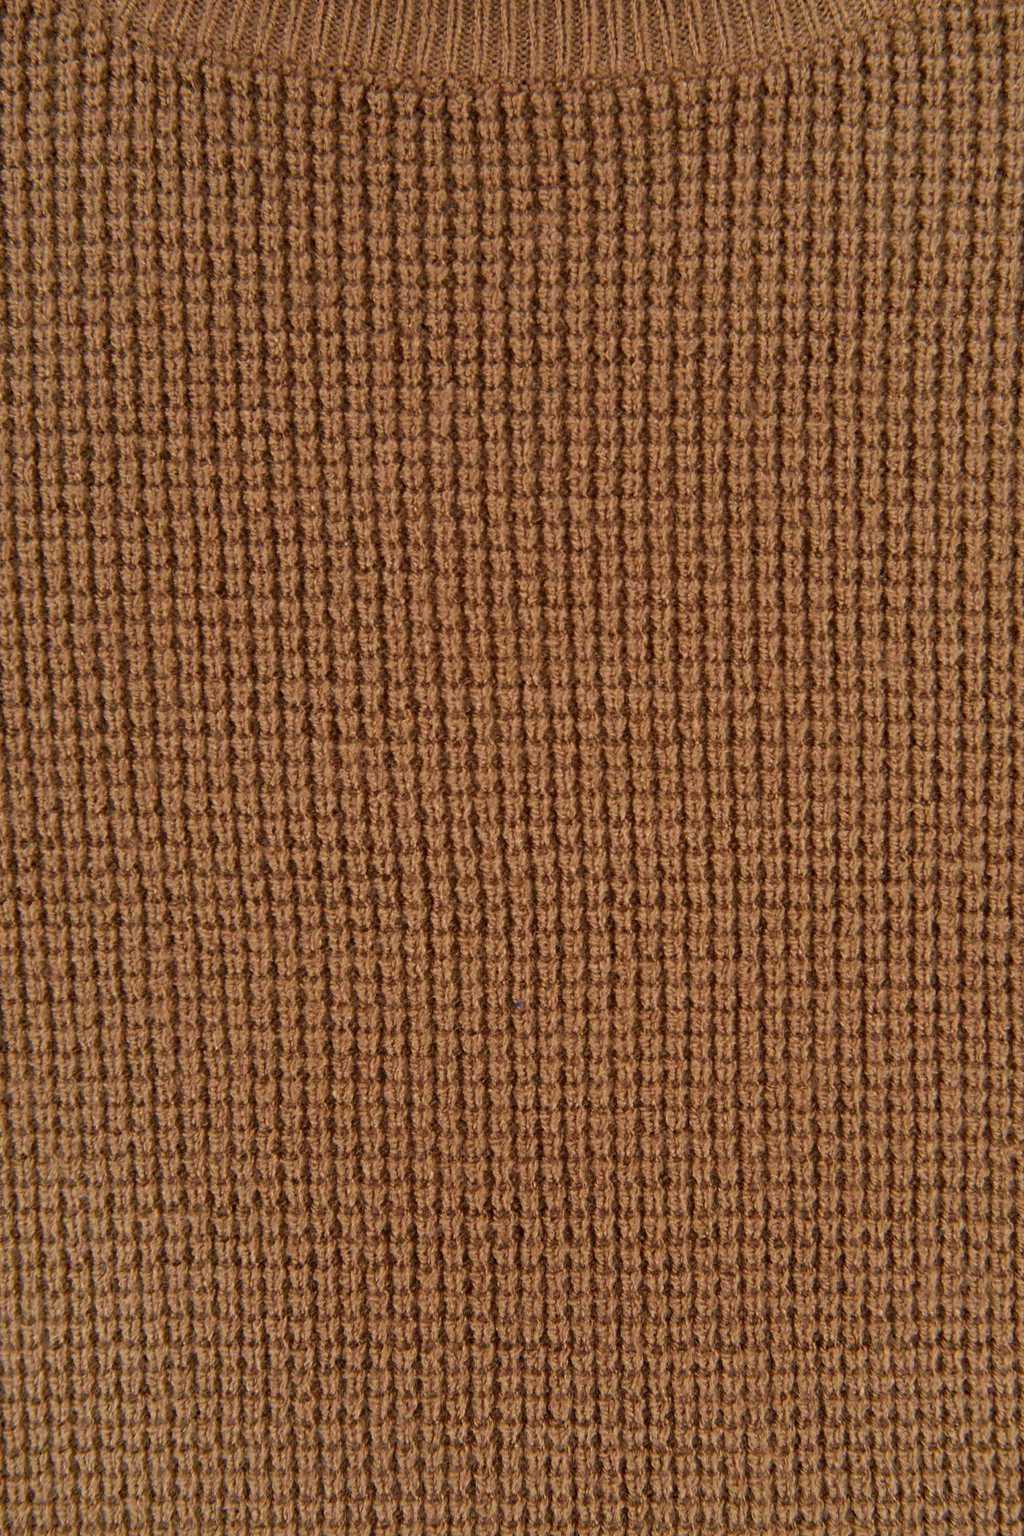 Sweater 24272019 Beige 18